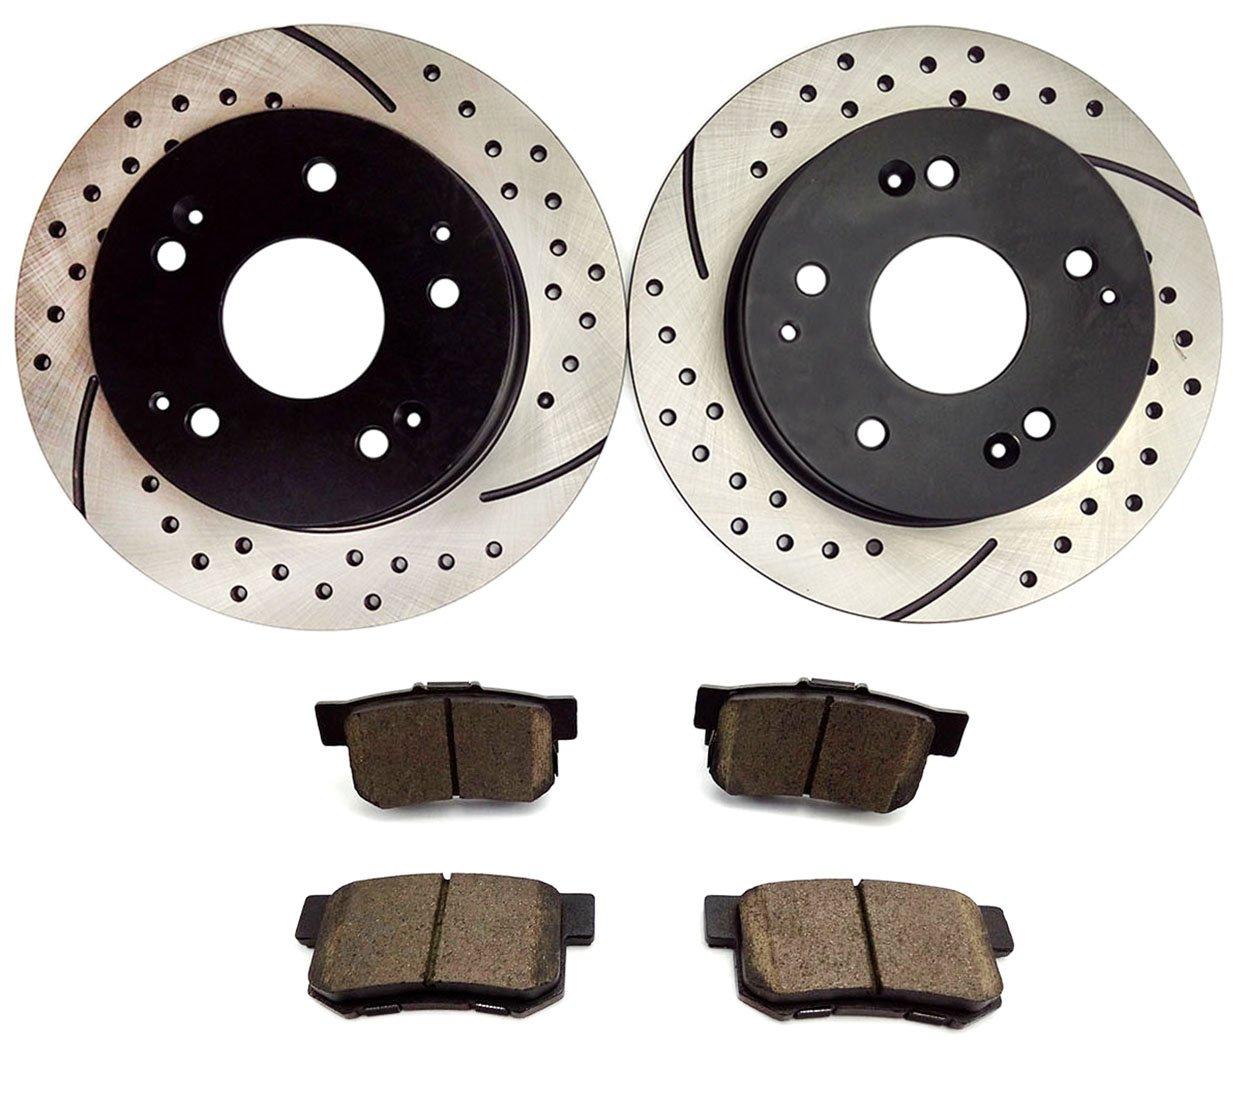 Rear Brake Discs Rotors For 1997-2001 Acura Integra Type R 1998-02 Honda Accord